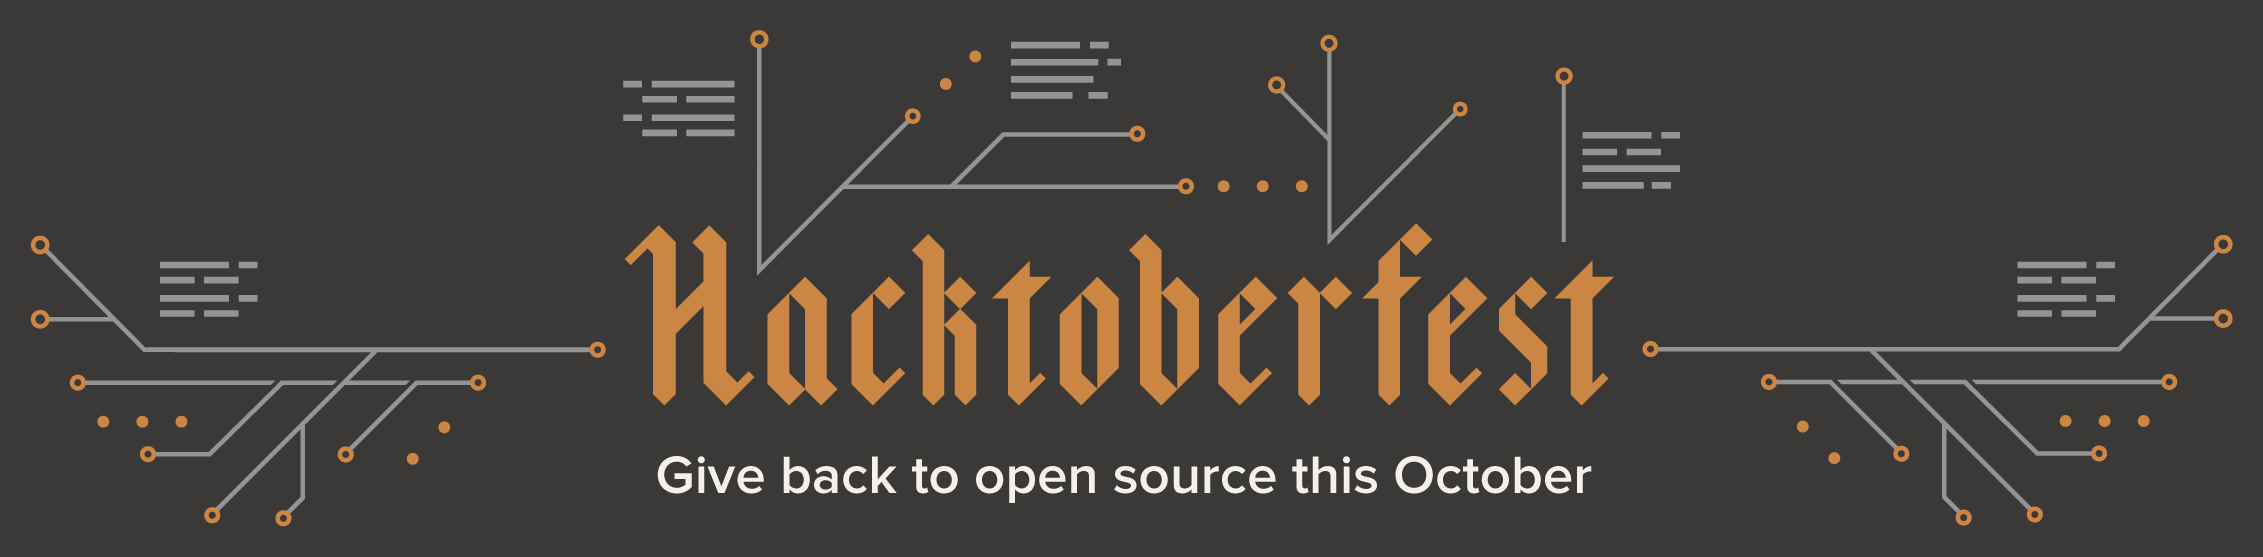 Hacktoberfest logo